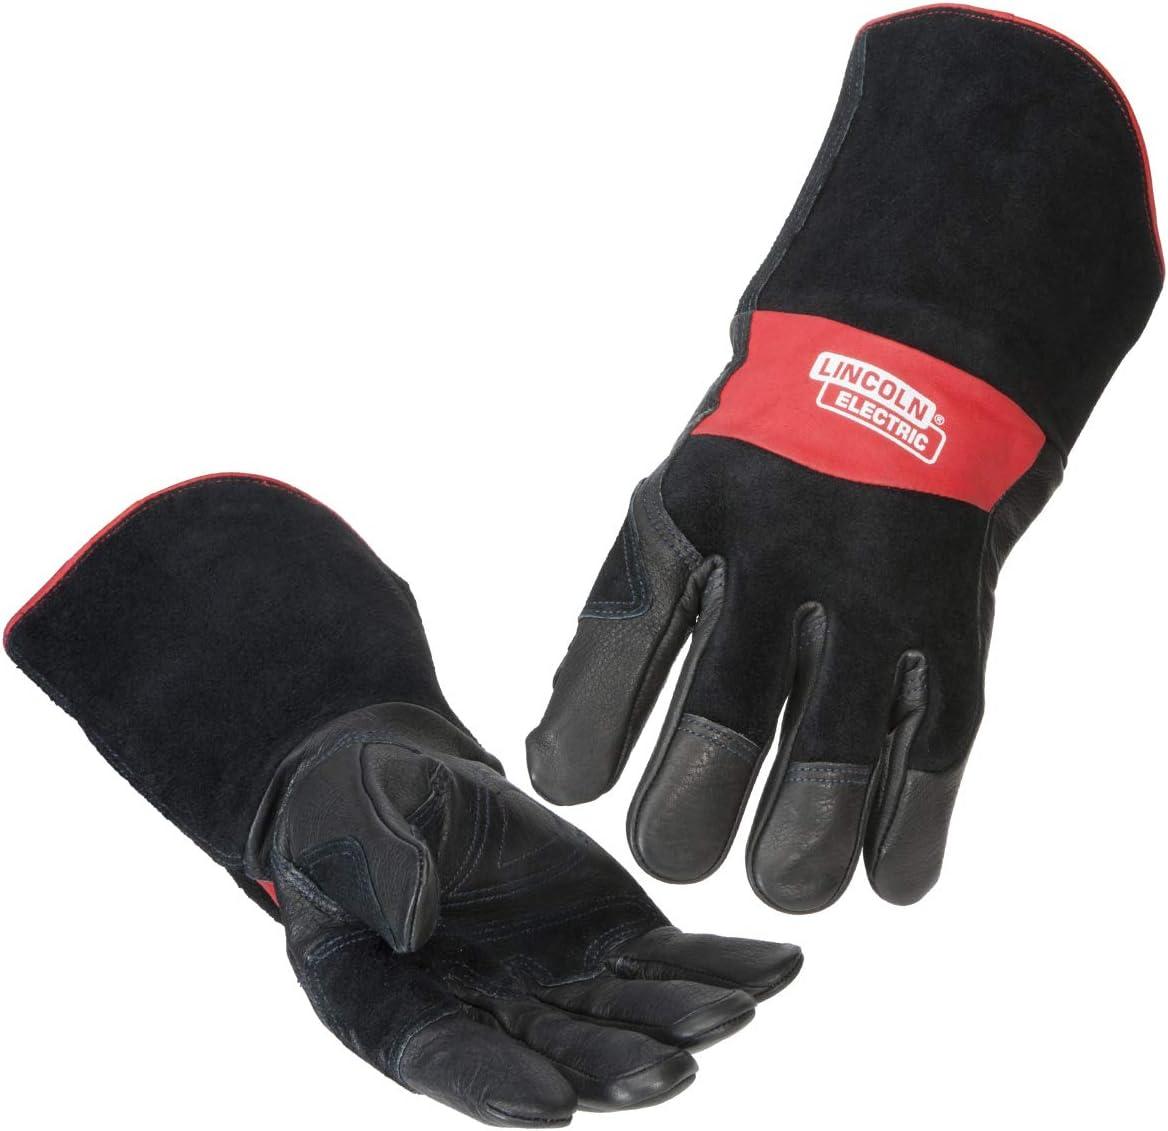 Lincoln Electric Premium Leather MIG Stick Welding Gloves | Heat Resistance & Dexterity| Medium | K2980-M,black, Red